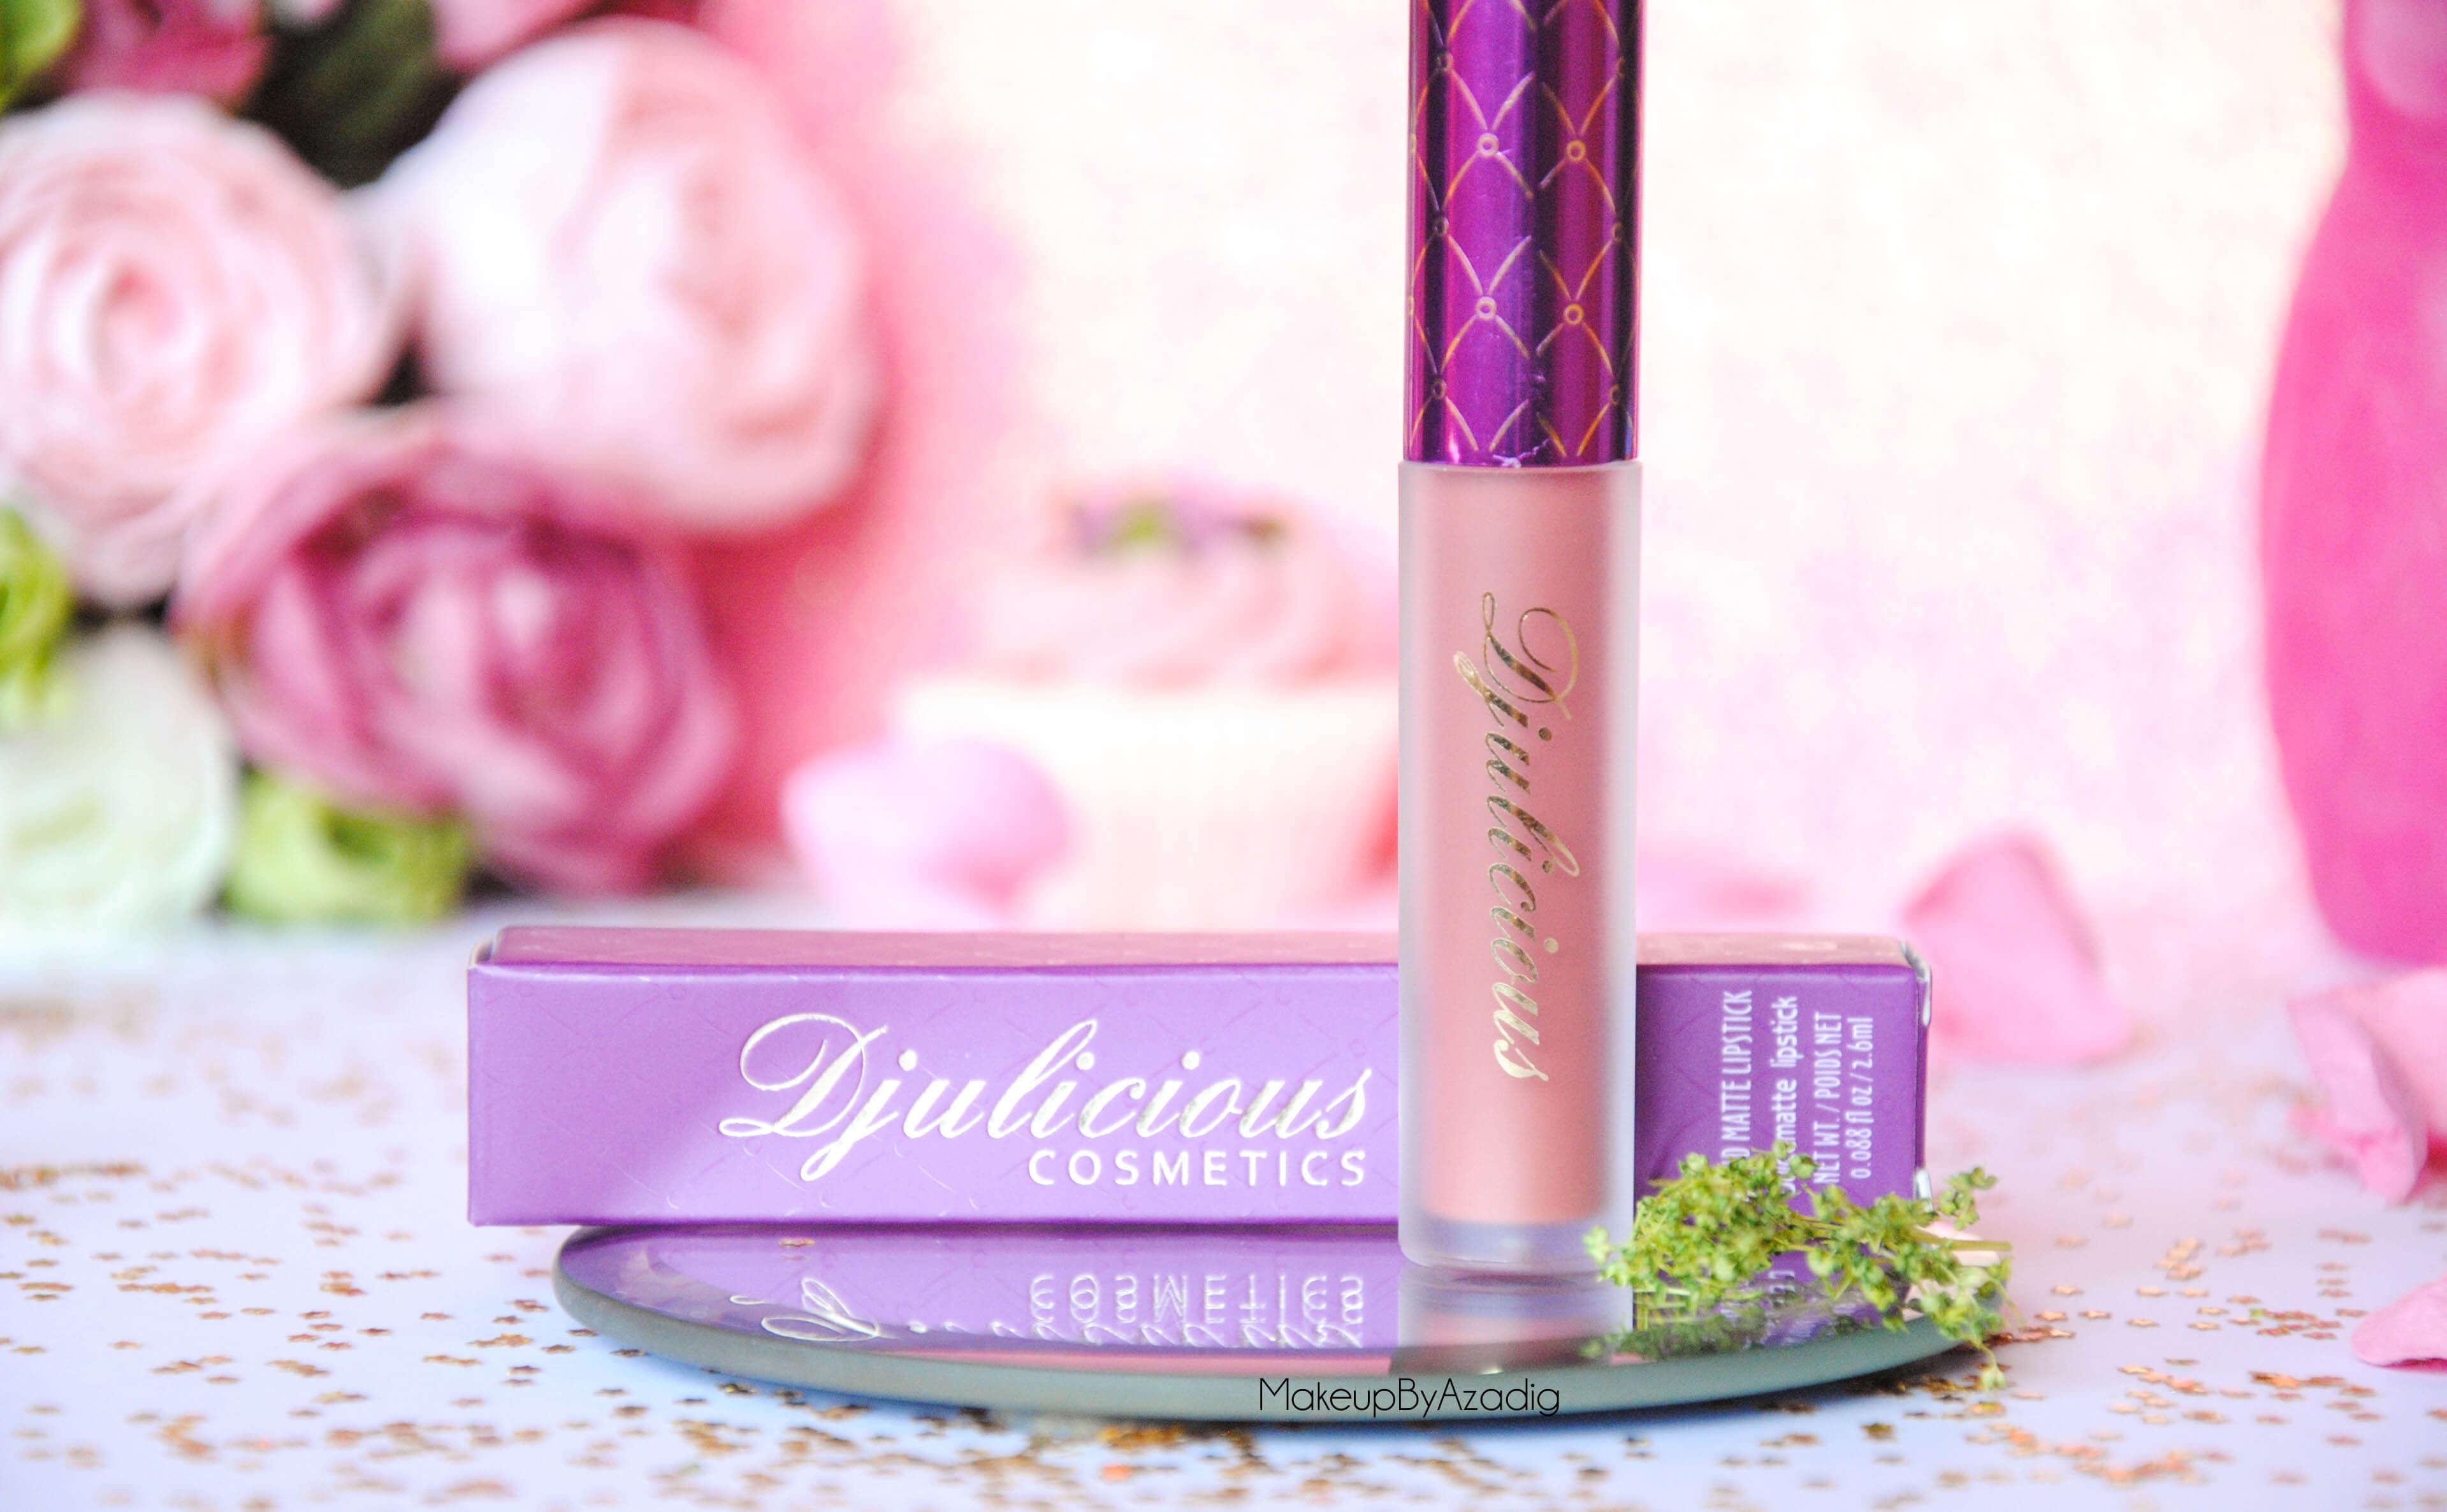 makeupbyazadig-djulicious-cosmetics-sananas-peekabooo-knoetzie-natacha-birds-julie-world-of-beauty-booolicious-sanoulicious-paris-troyes-dijon-dulcematte-revue-lips